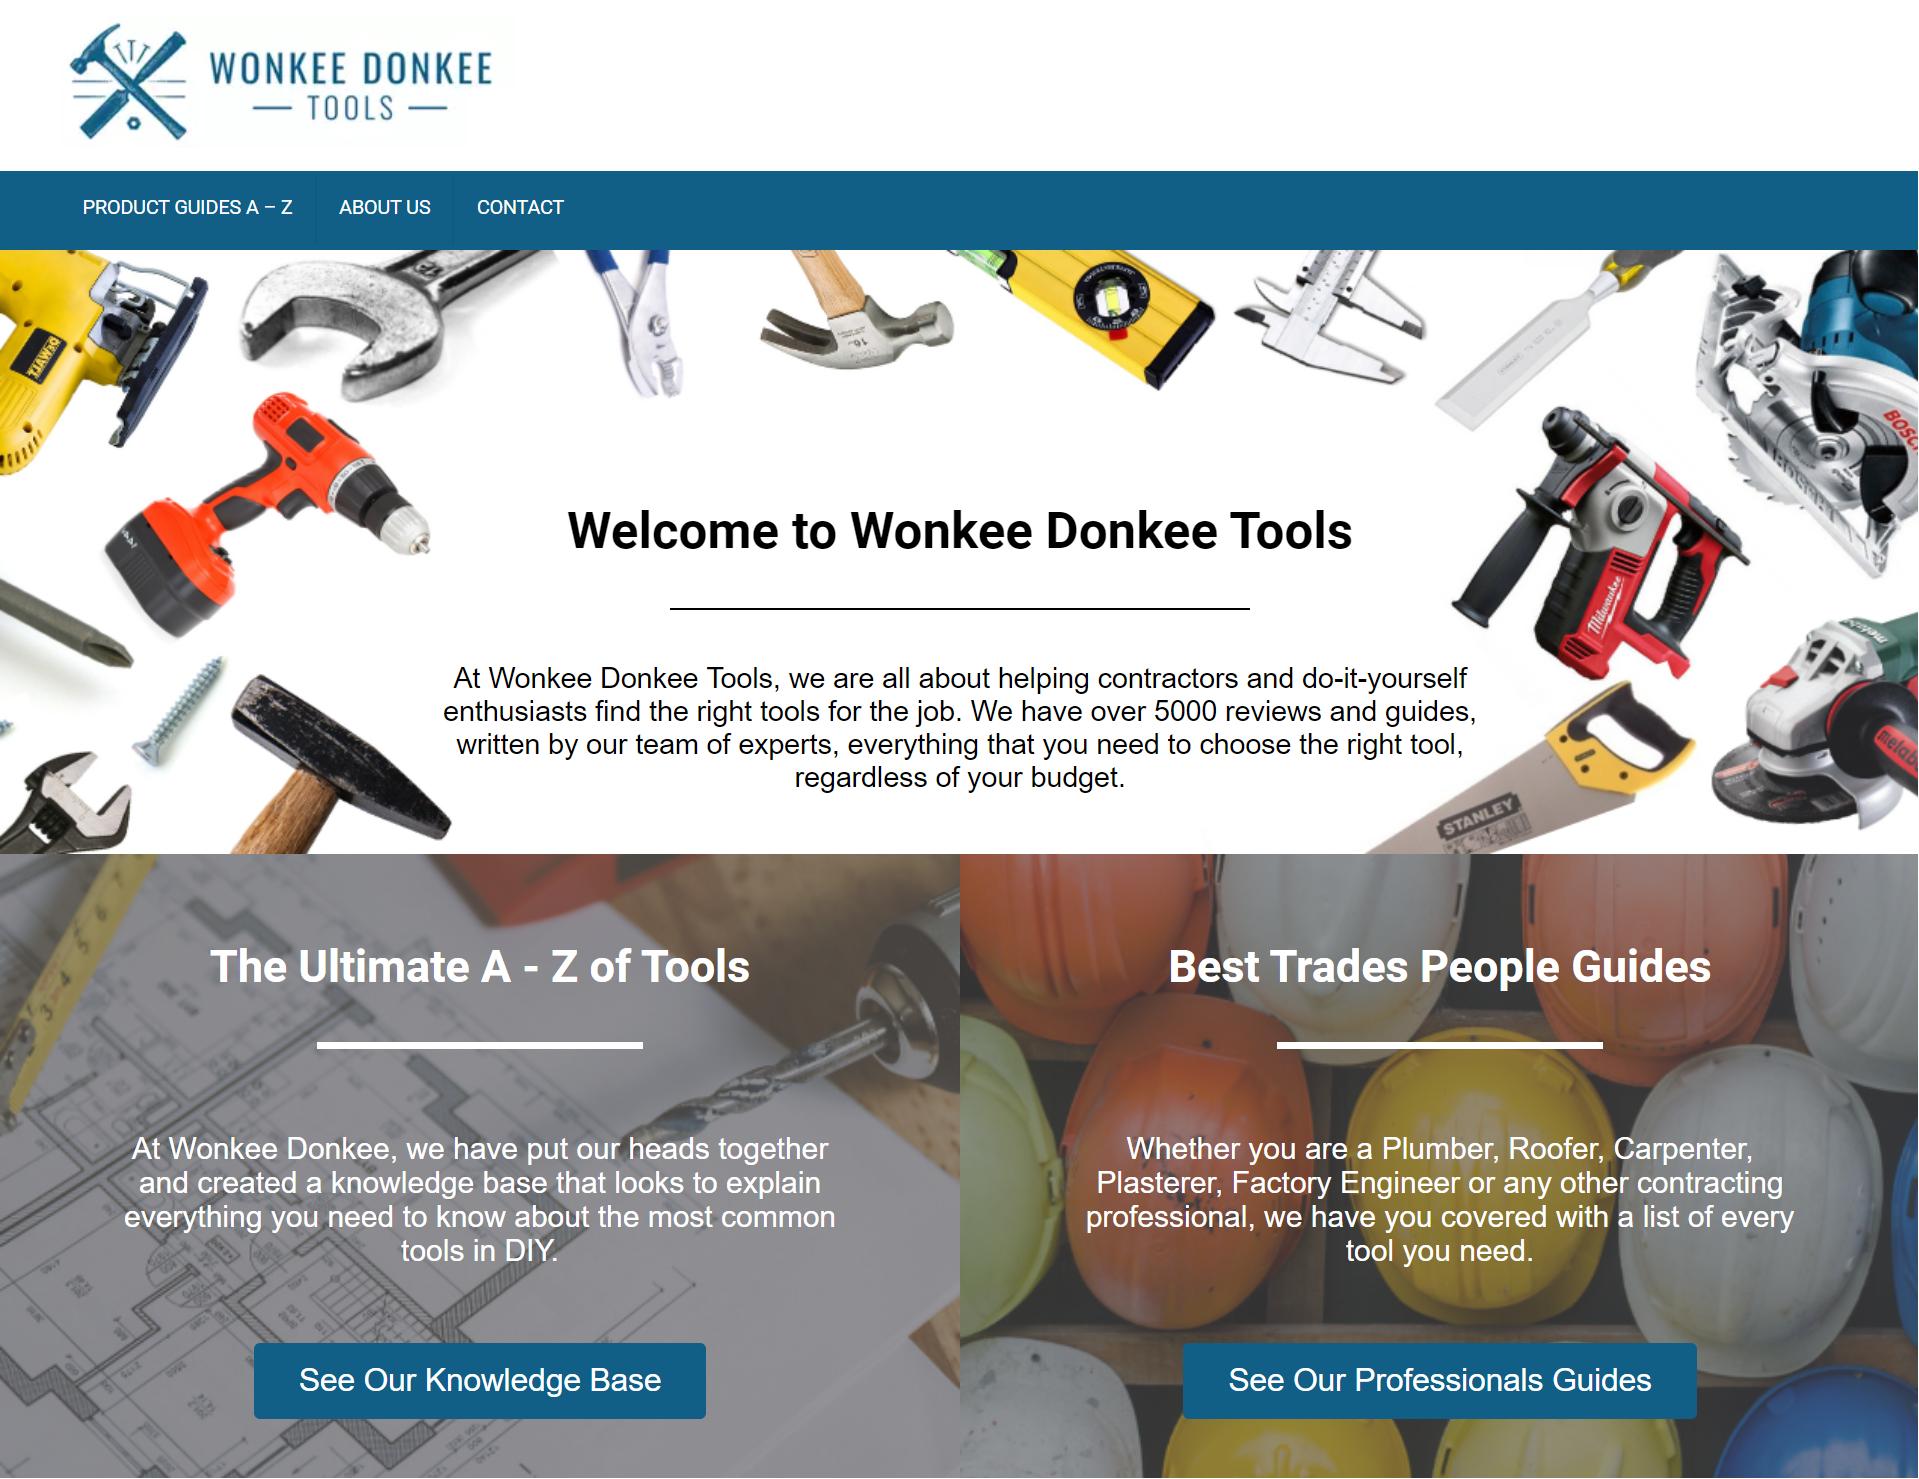 Wonkee Donkee Tools Website Design in Mid Wales